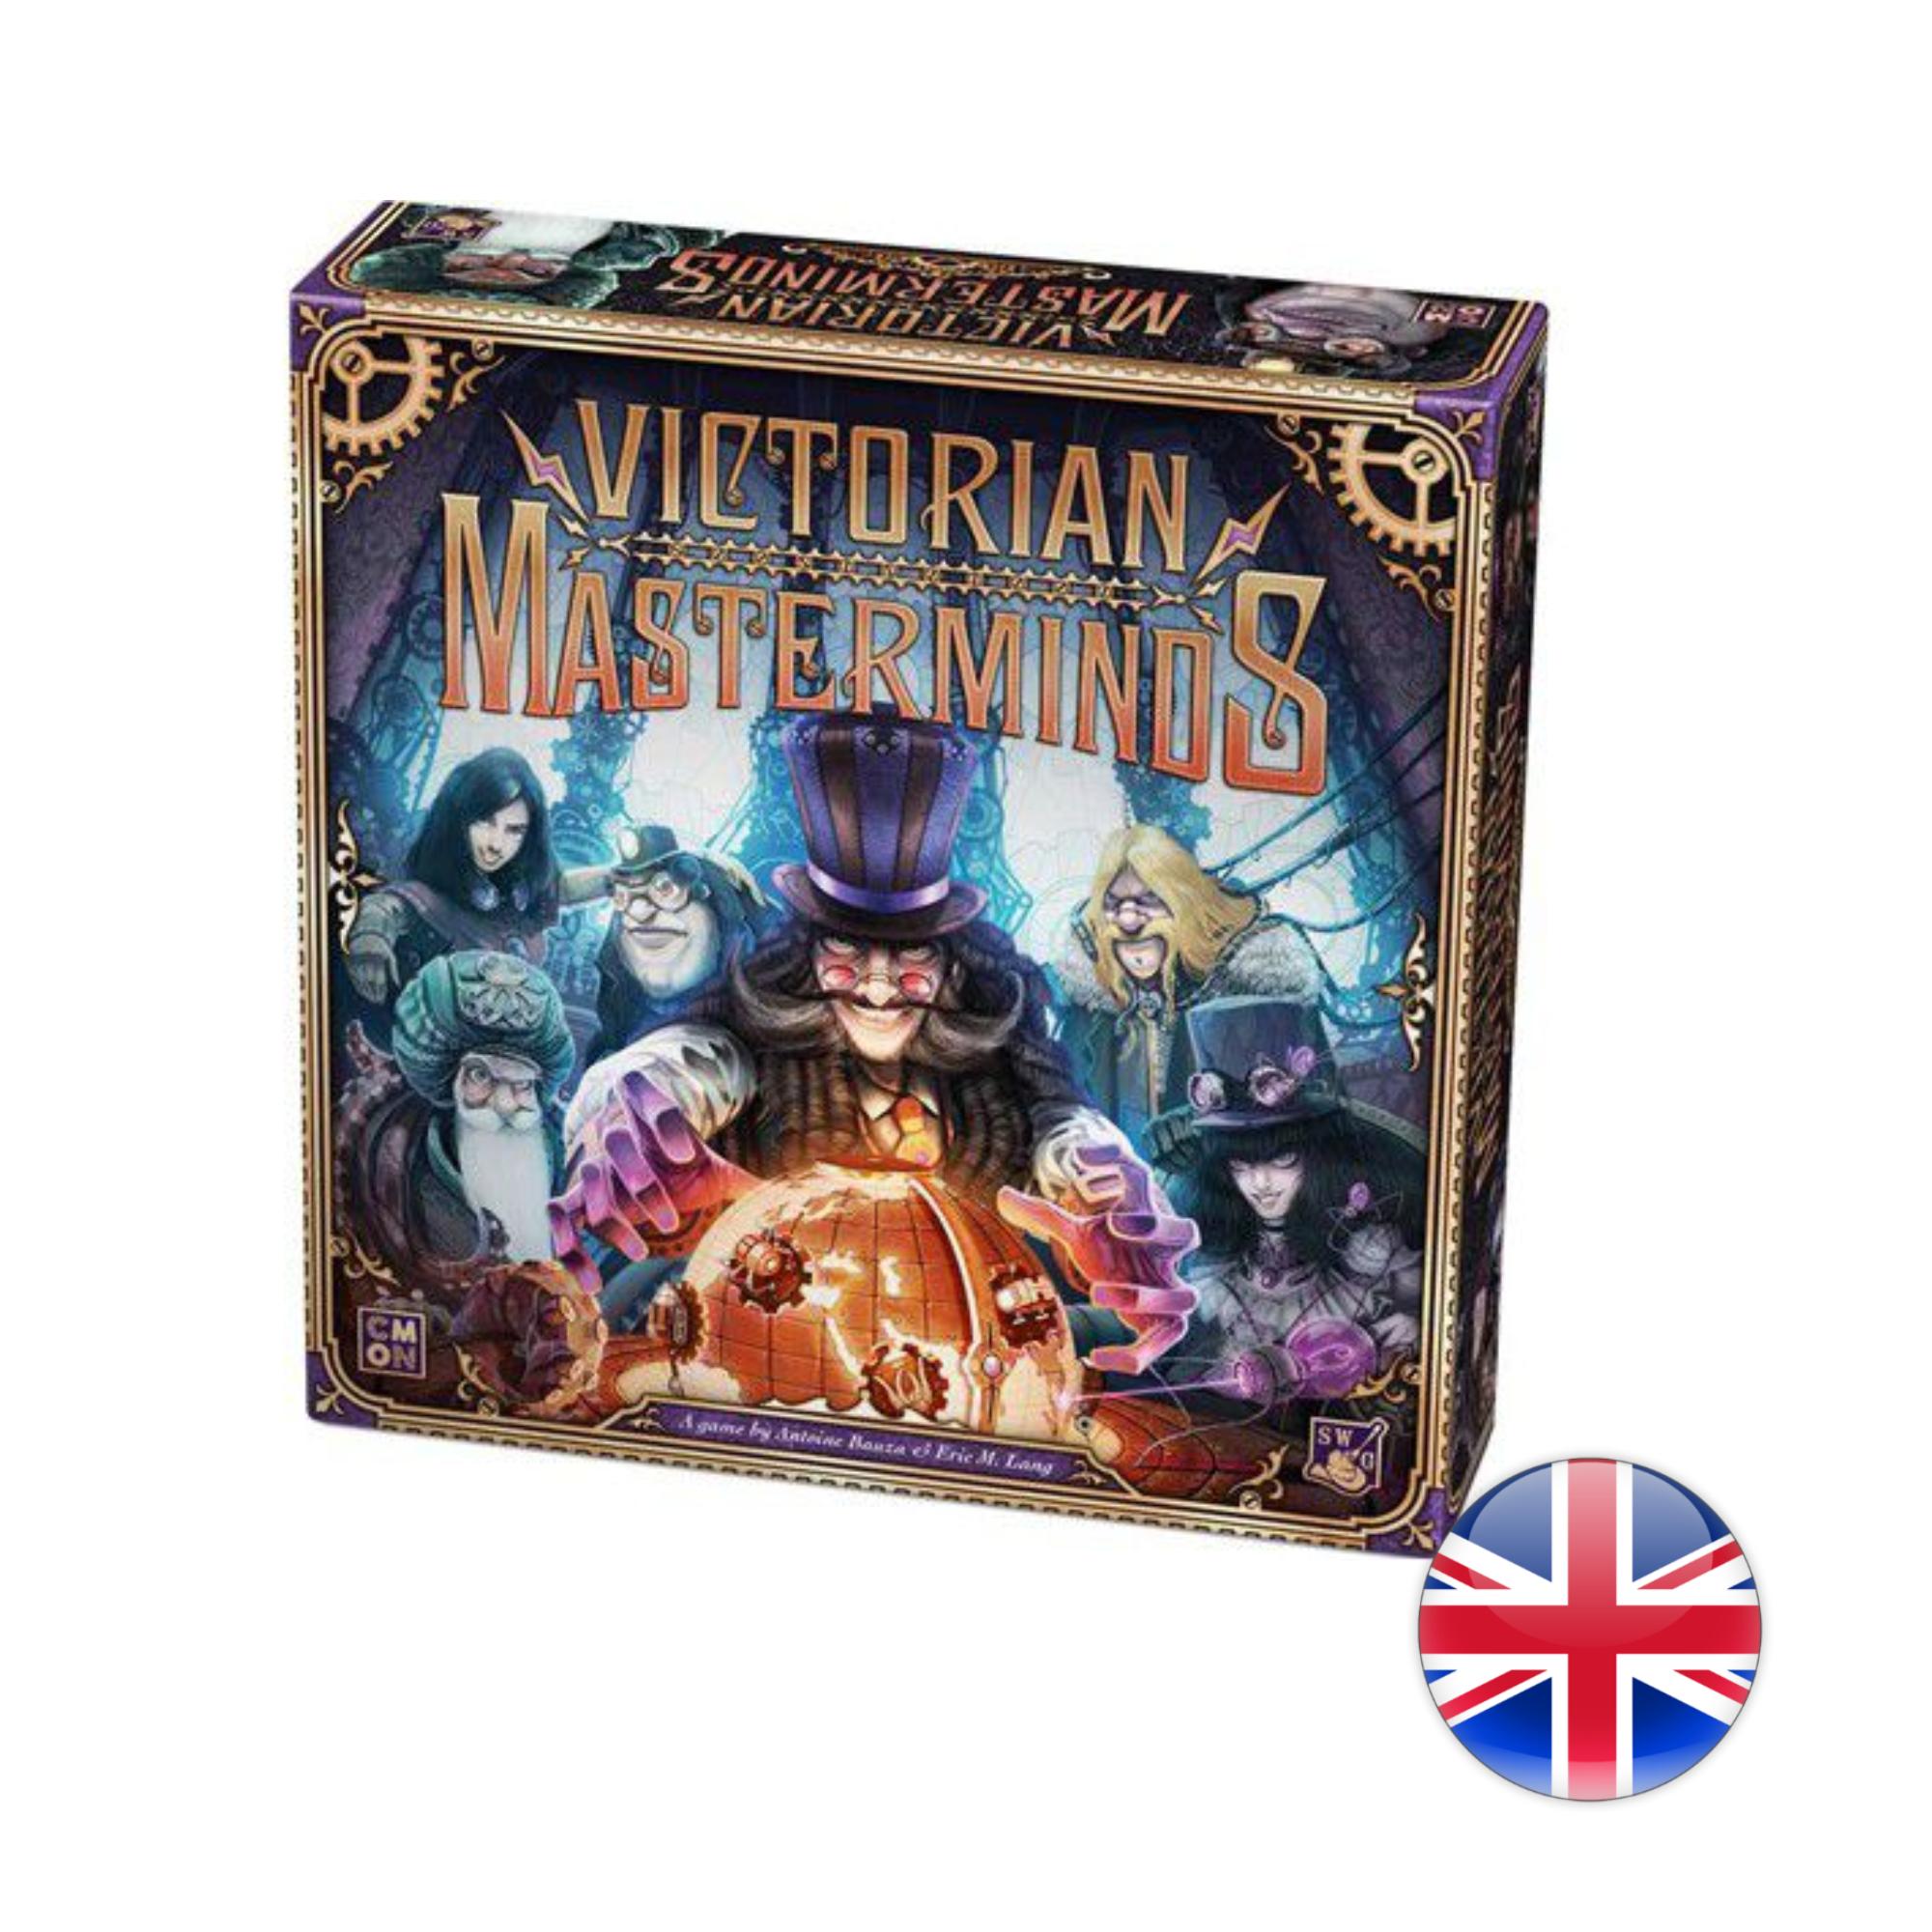 CMON Limited Victorian Mastermind